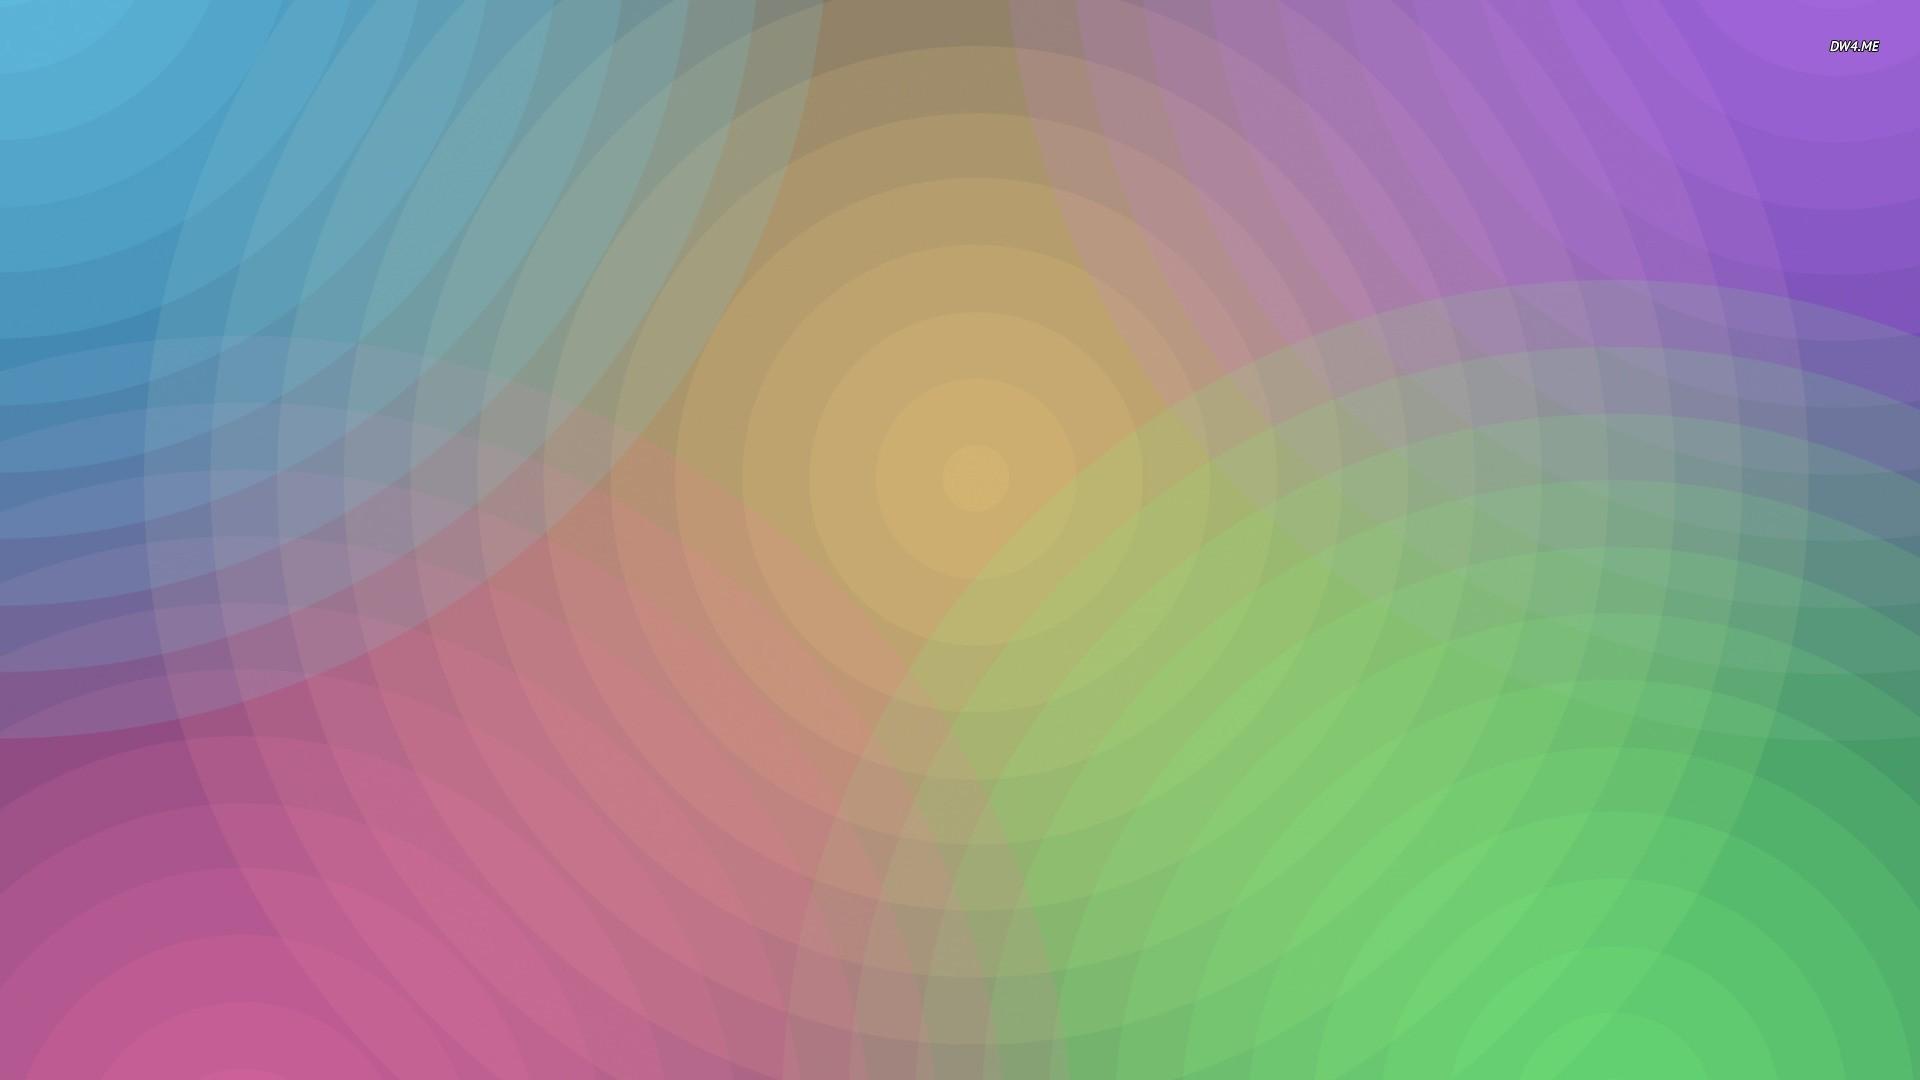 Pastel Color Desktop wallpaper